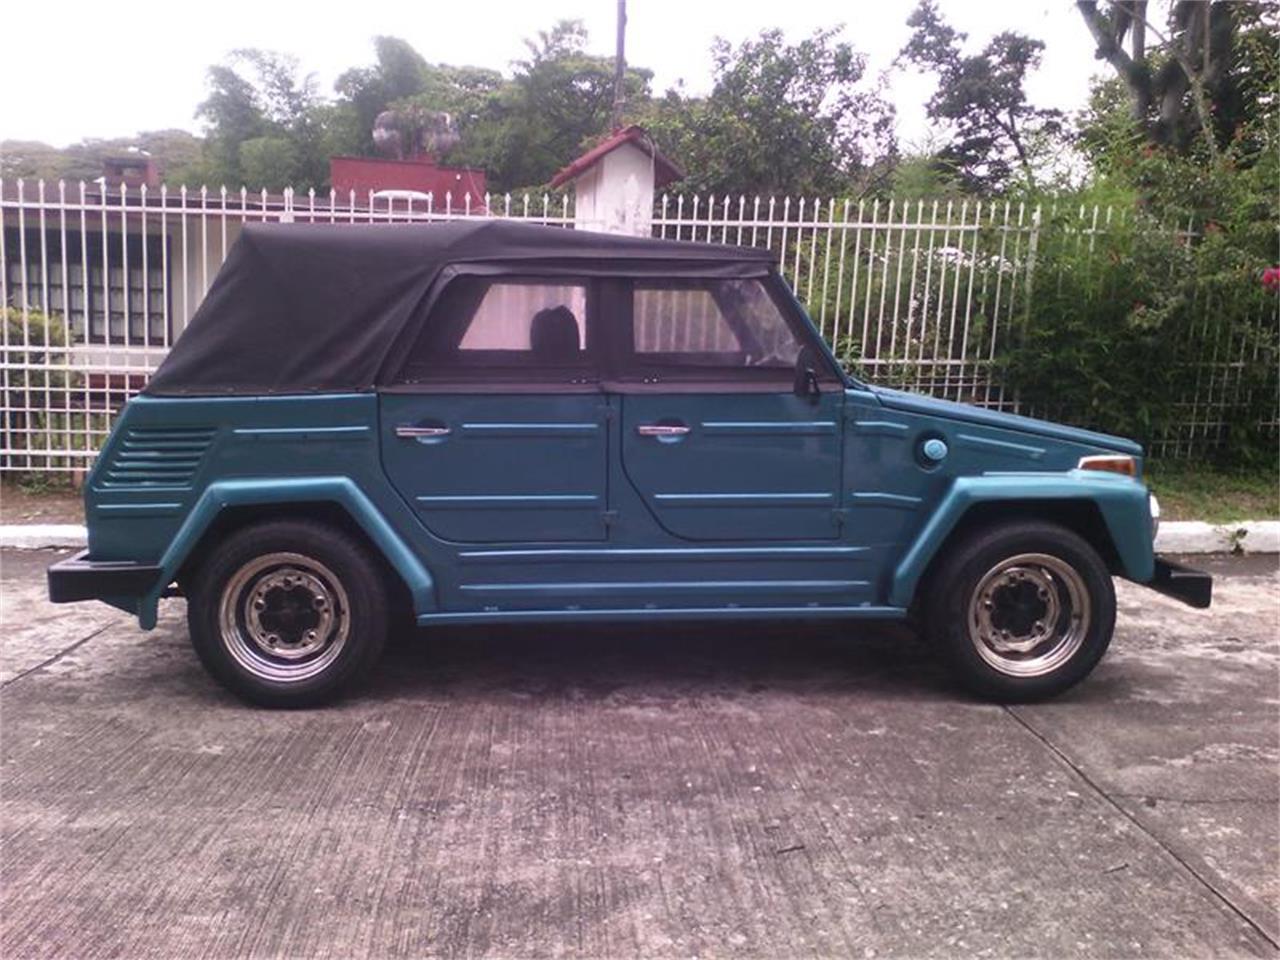 Volkswagen San Luis Obispo >> 1973 Volkswagen Transporter For Sale In San Luis Obispo Ca